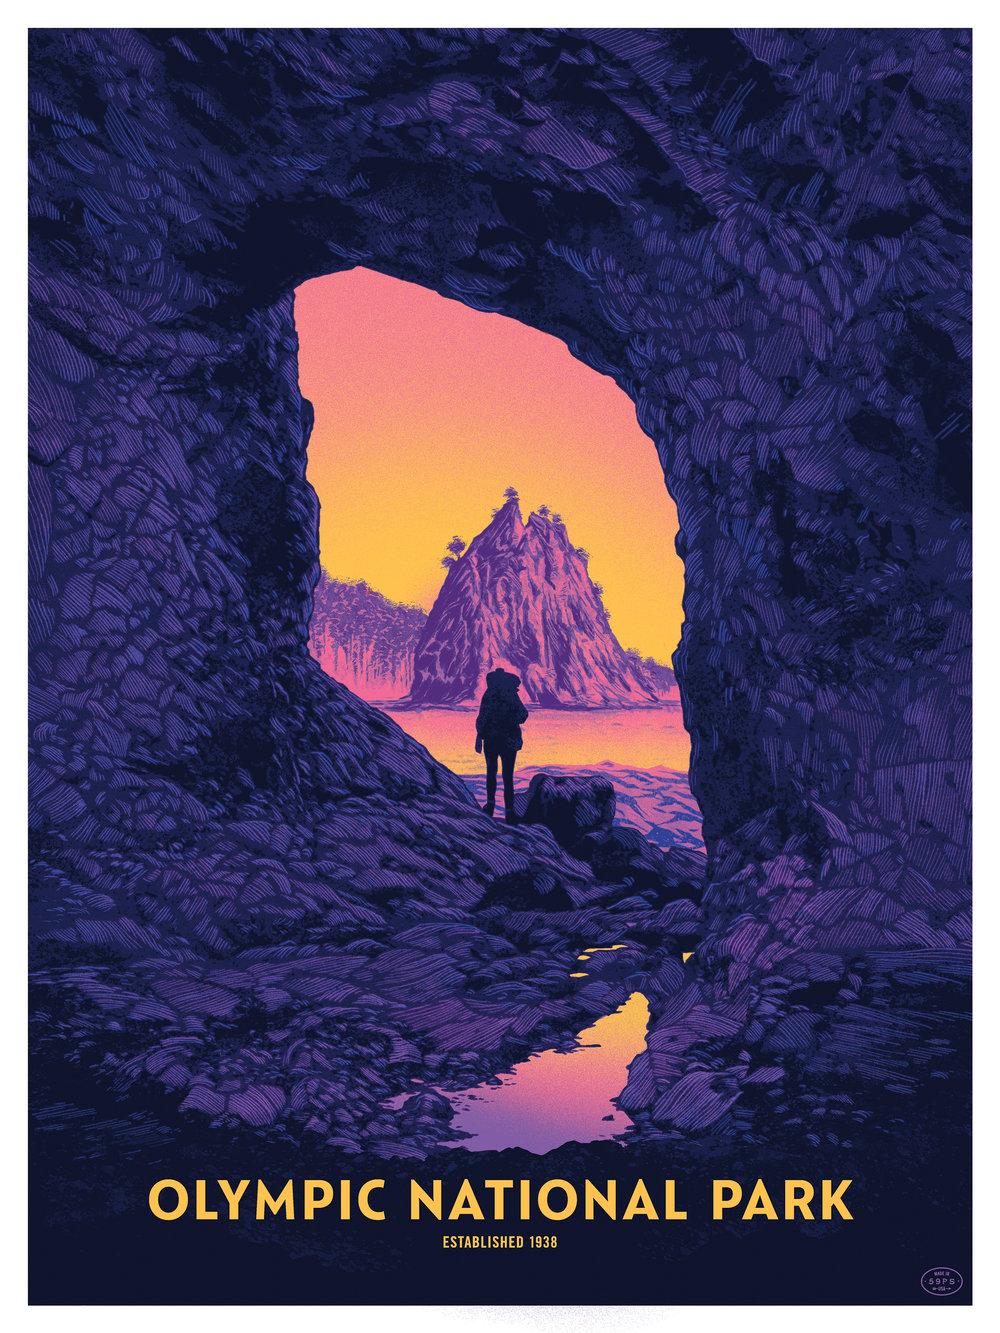 Olympic-National-Park-Daniel-Danger-Fifty-Nine-Parks-Print-Series_rgb.jpg